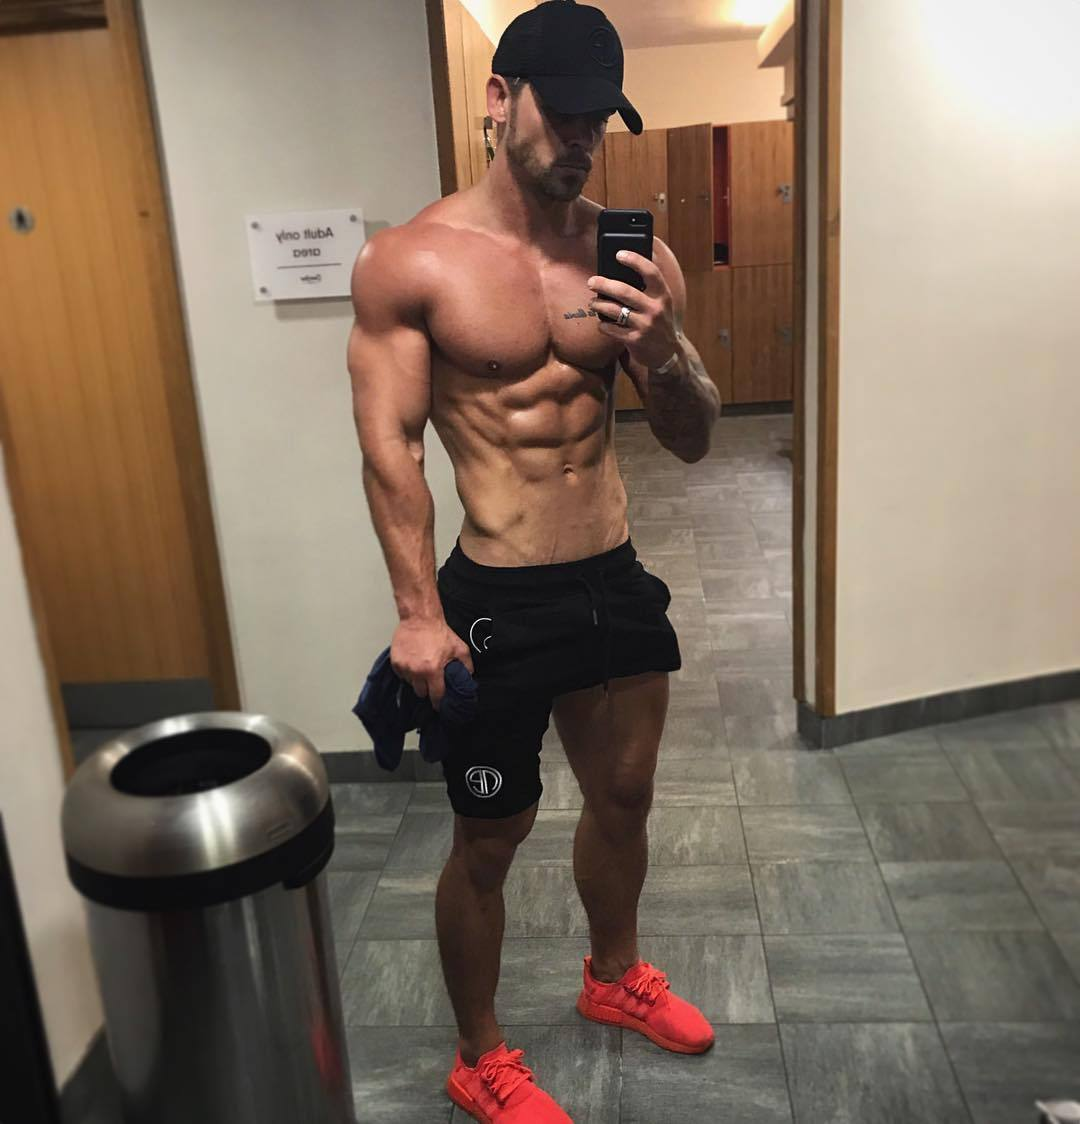 strong-shirtless-muscular-bad-boy-ripped-abs-pecs-selfie